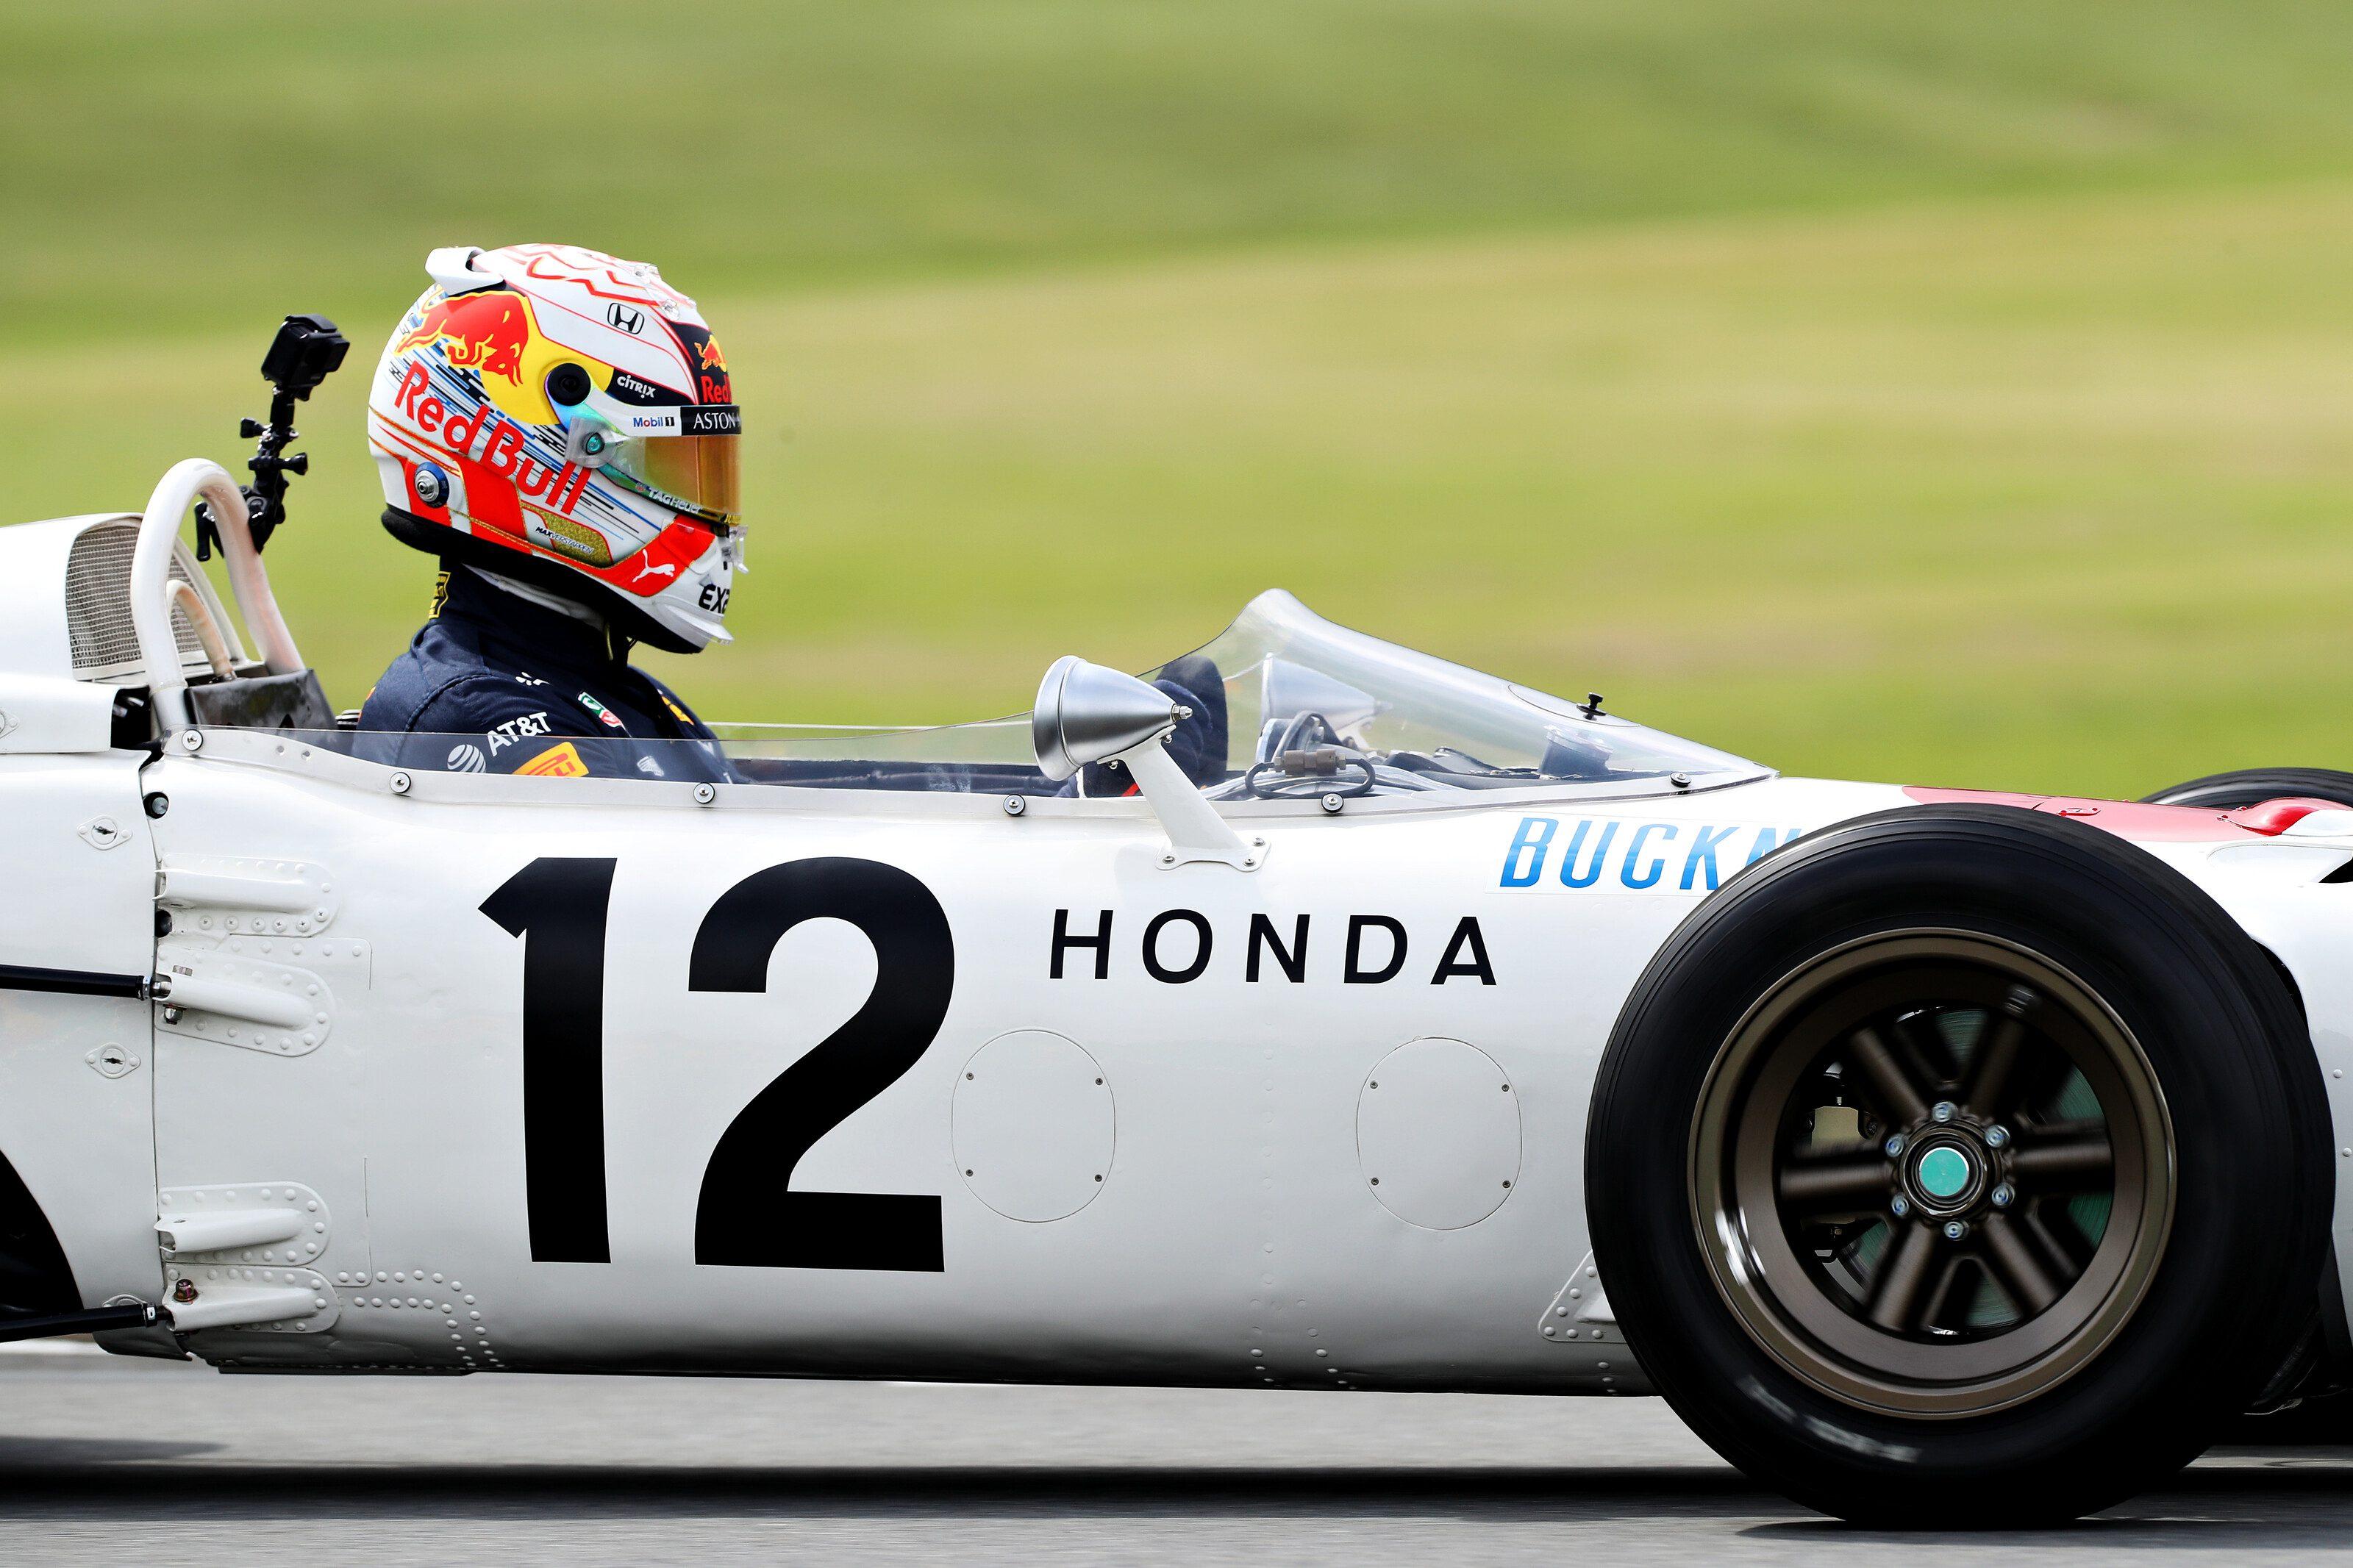 Photos : Max Verstappen au volant de la Honda RA272 à Suzuka 11